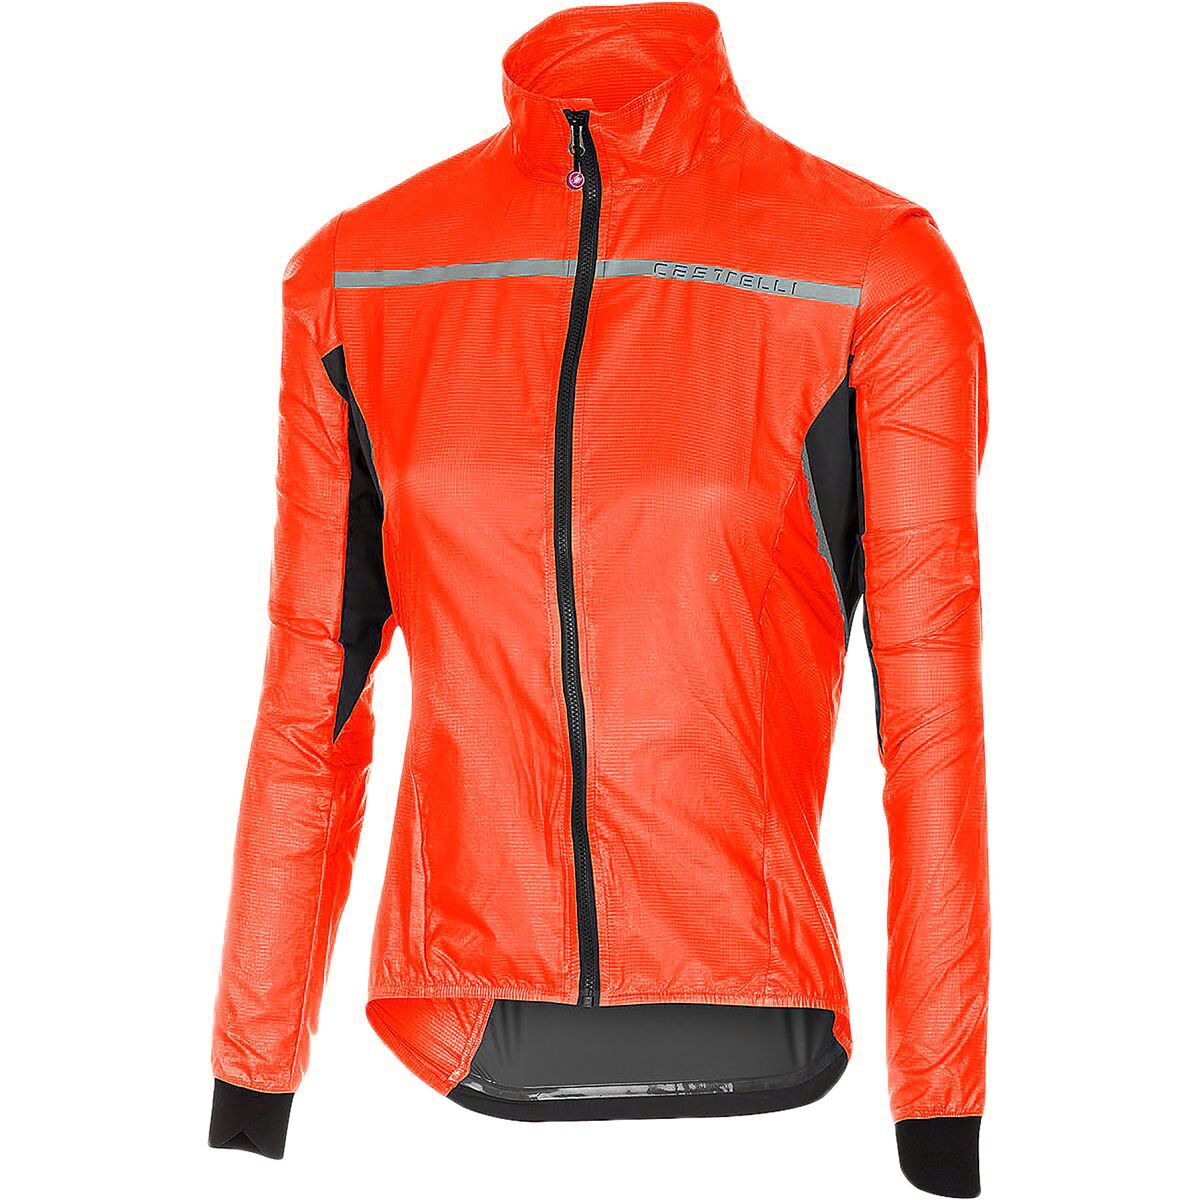 Waterproof Insert for Rainy Castelli Mens Superleggera Road Bike Cycling Jacket Winter and Spring Days